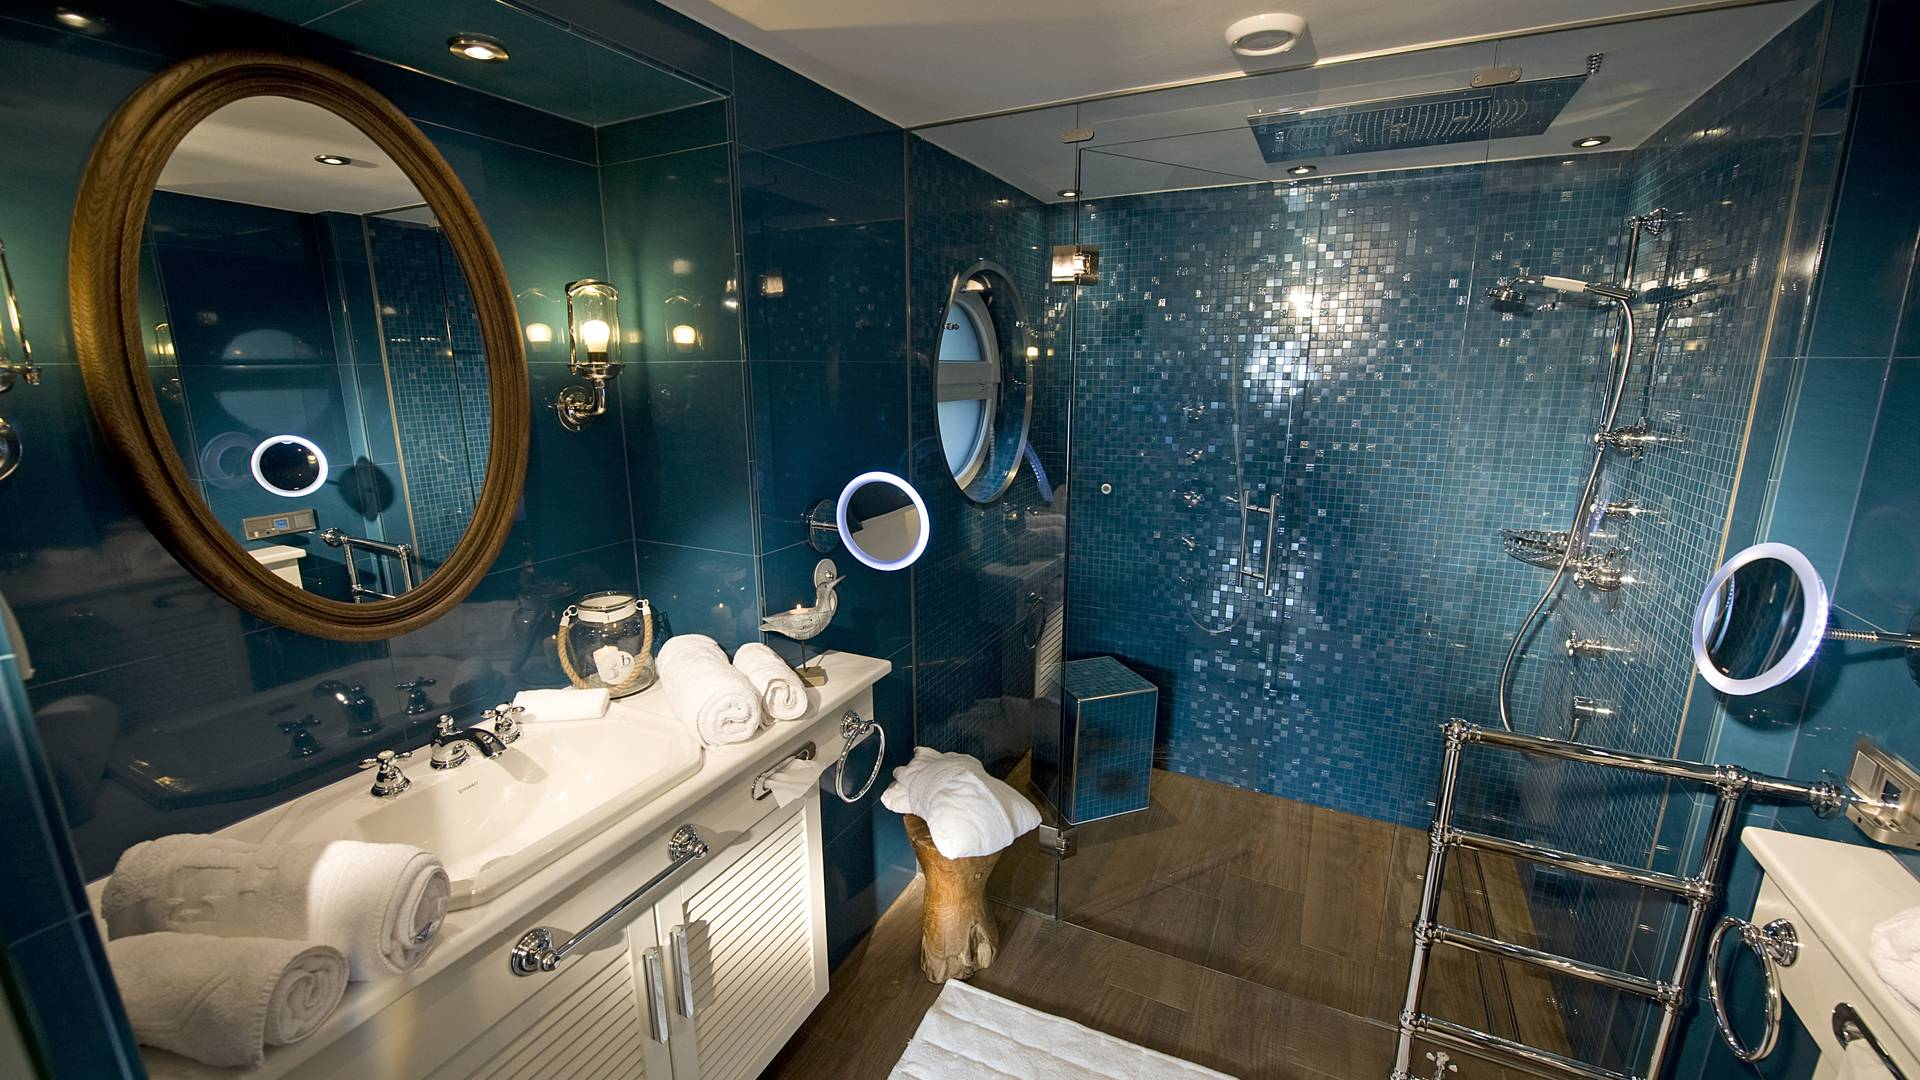 KOLLERs Hotel Bootshaus Suite Badezimmer